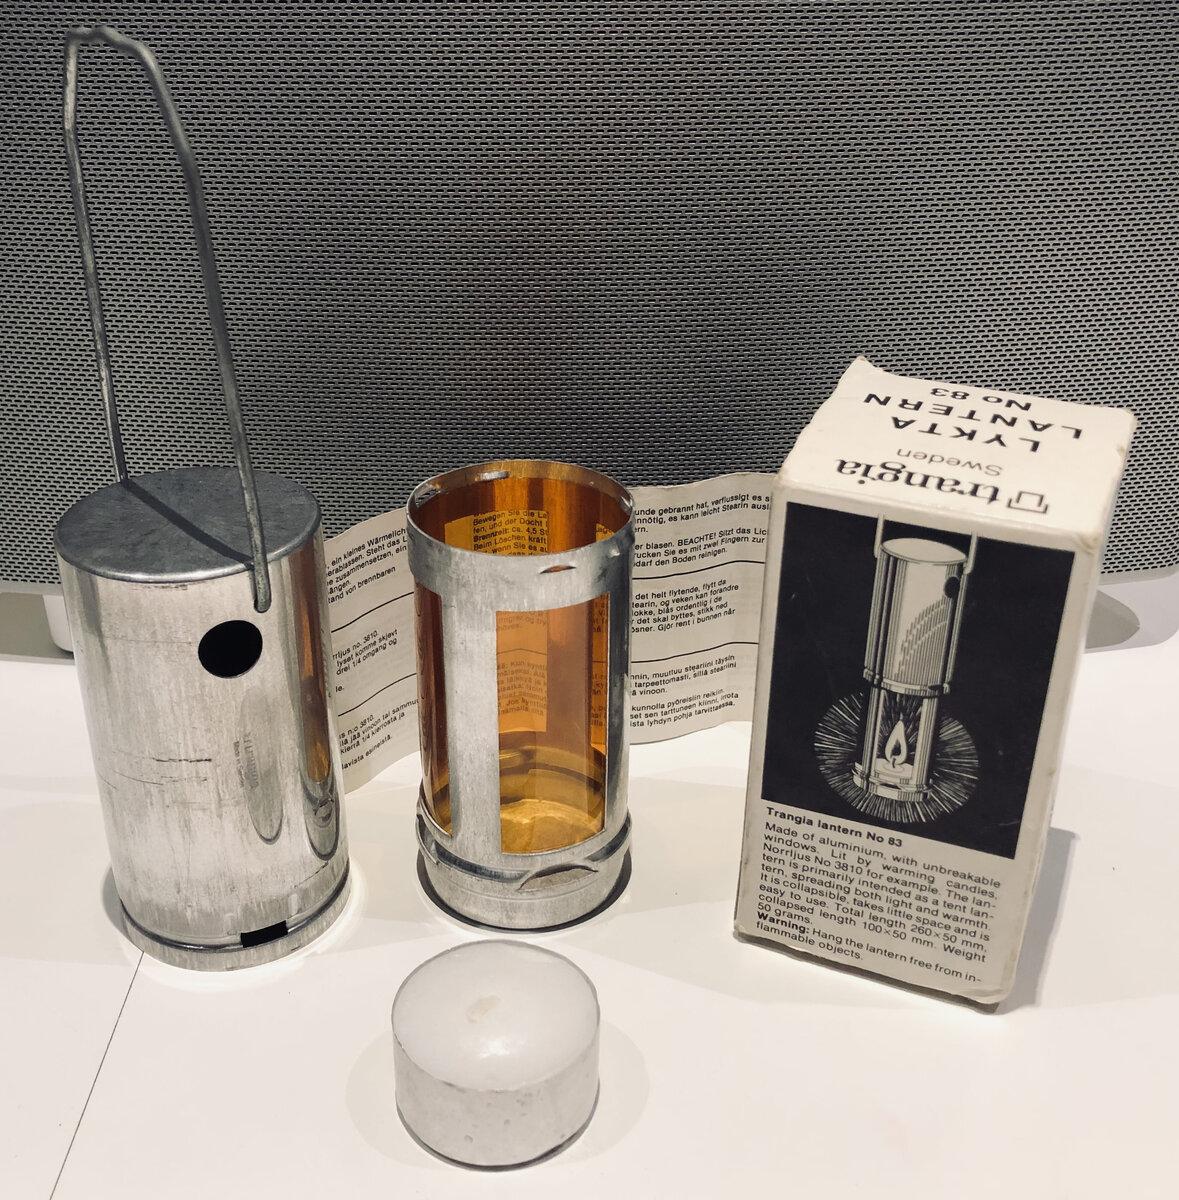 Trangia Lantern No.83.jpeg